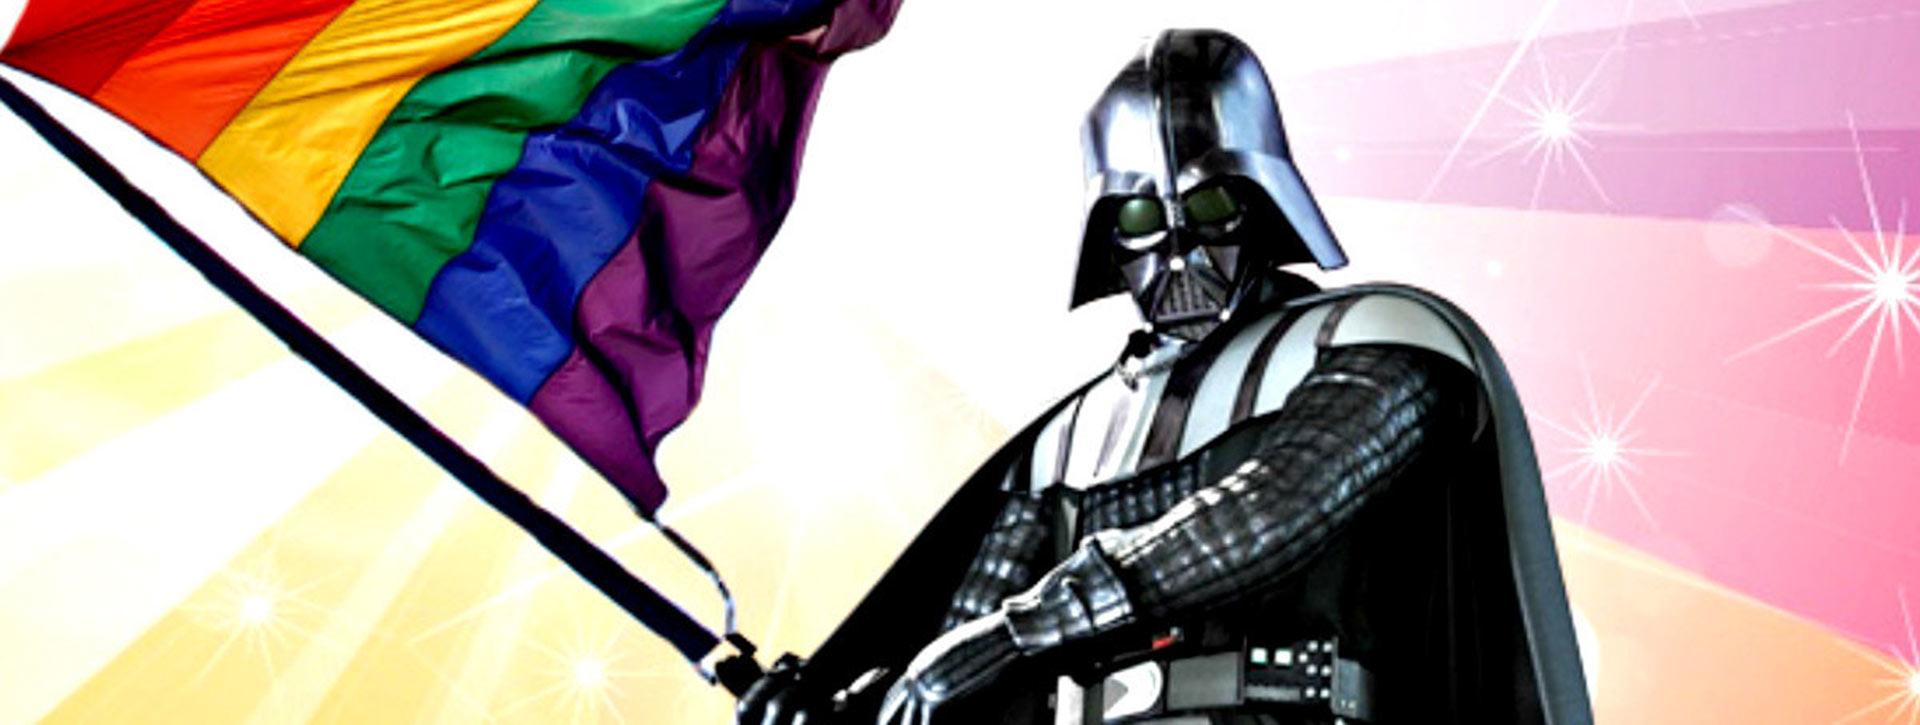 gay-star-wars-x1920